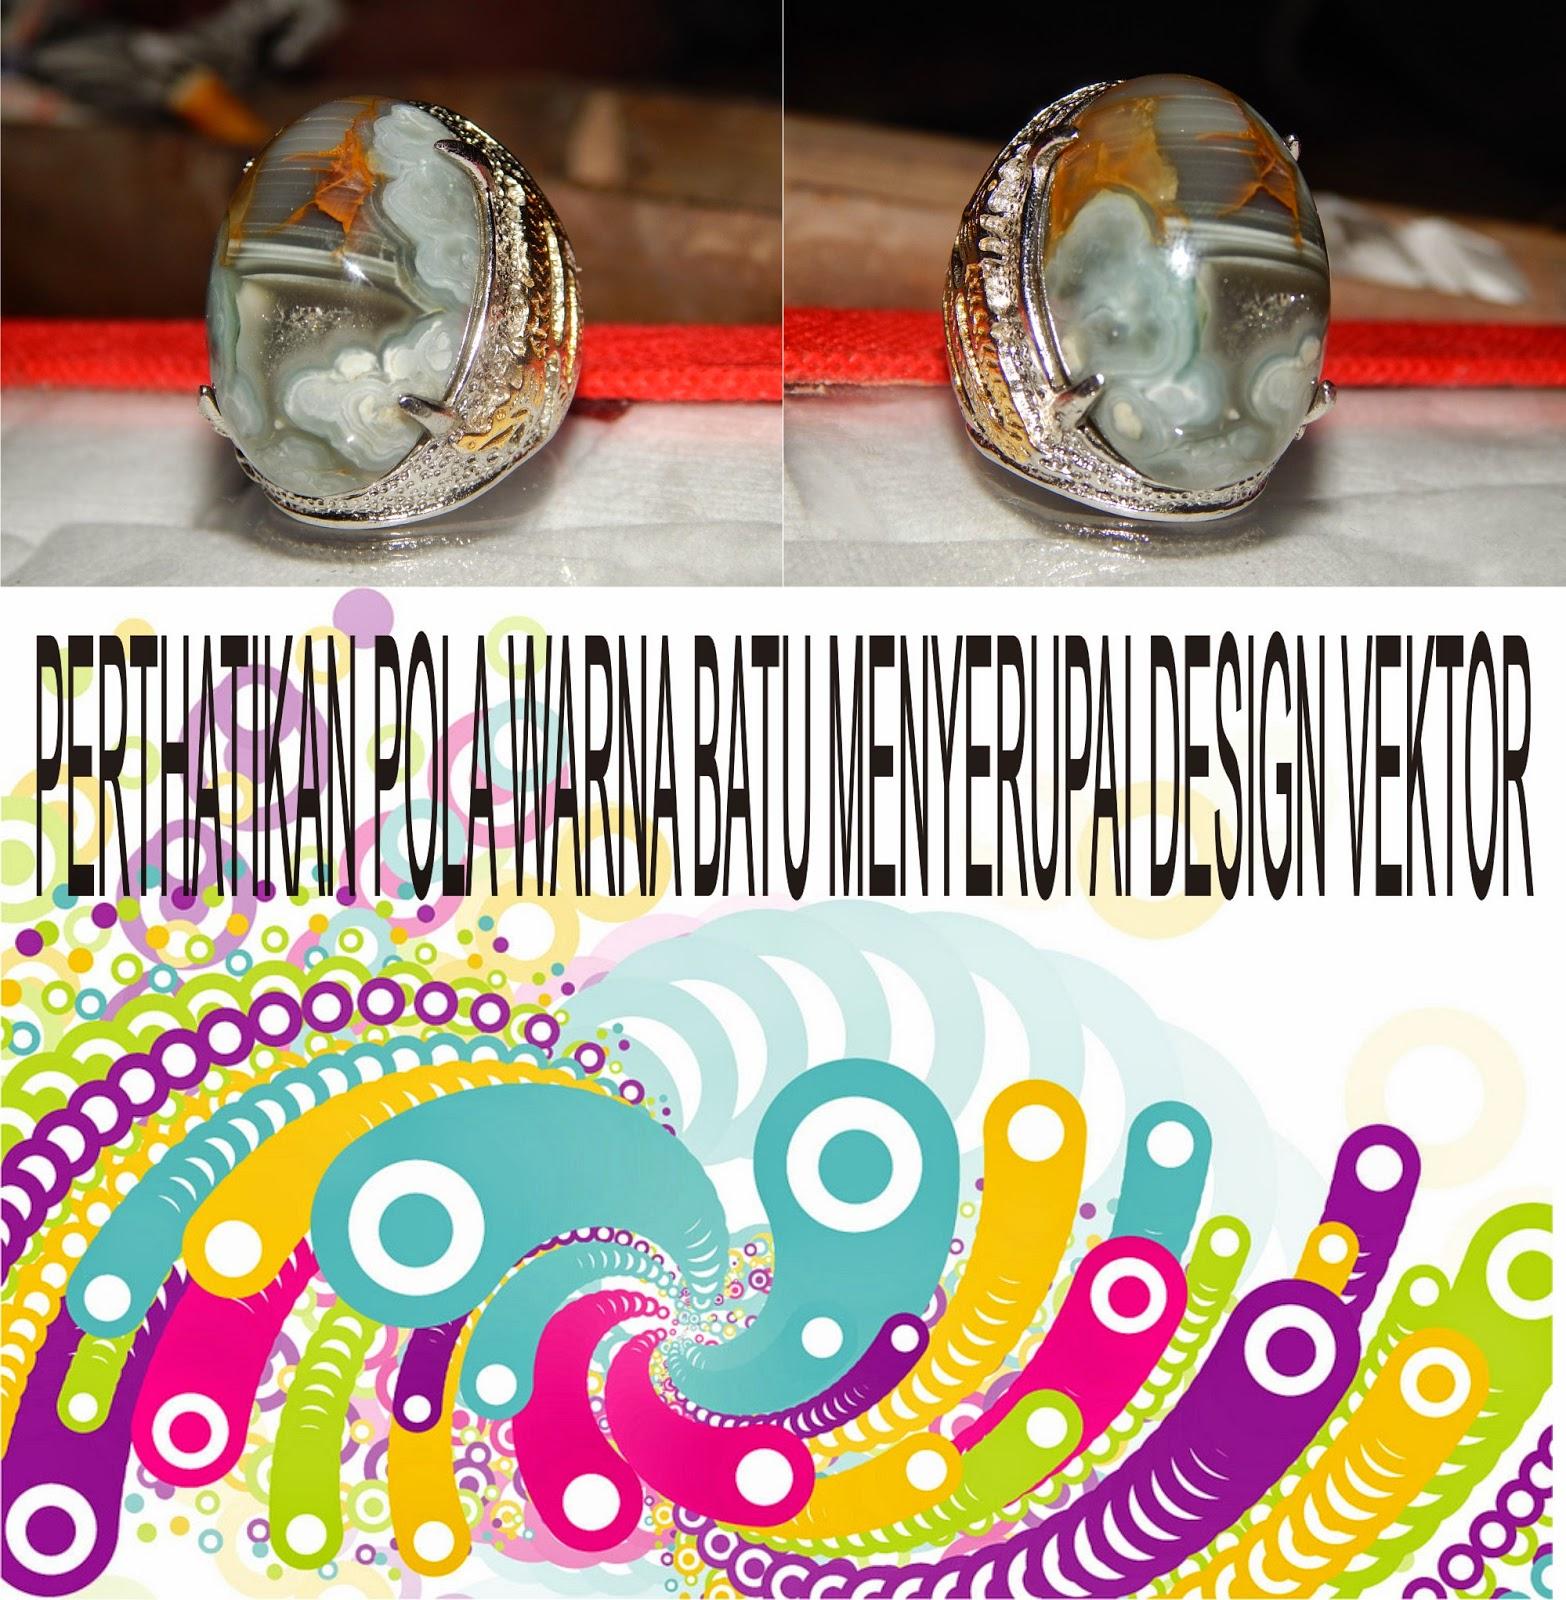 Limited Giok Panca Warna Motif Design Vektor